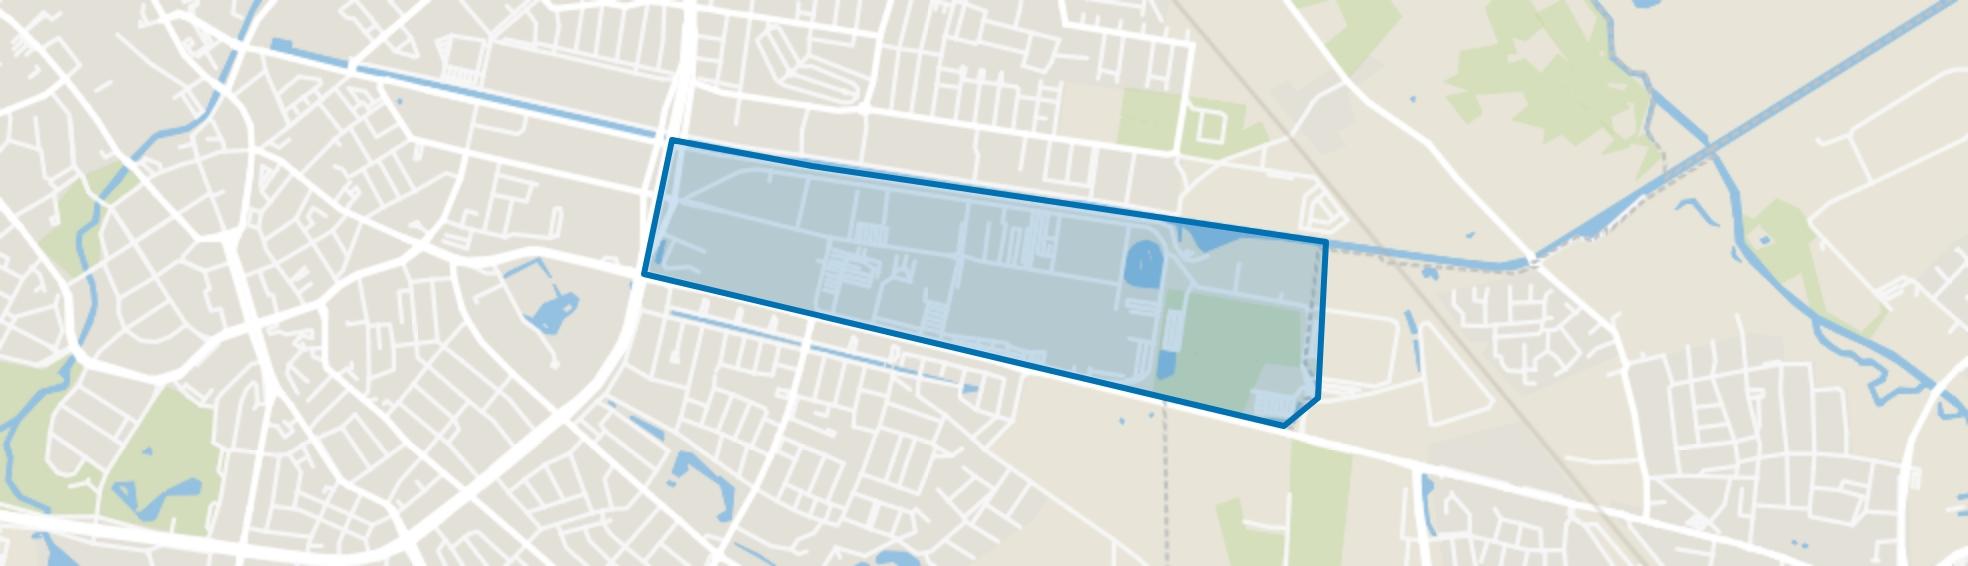 Poeijers, Eindhoven map